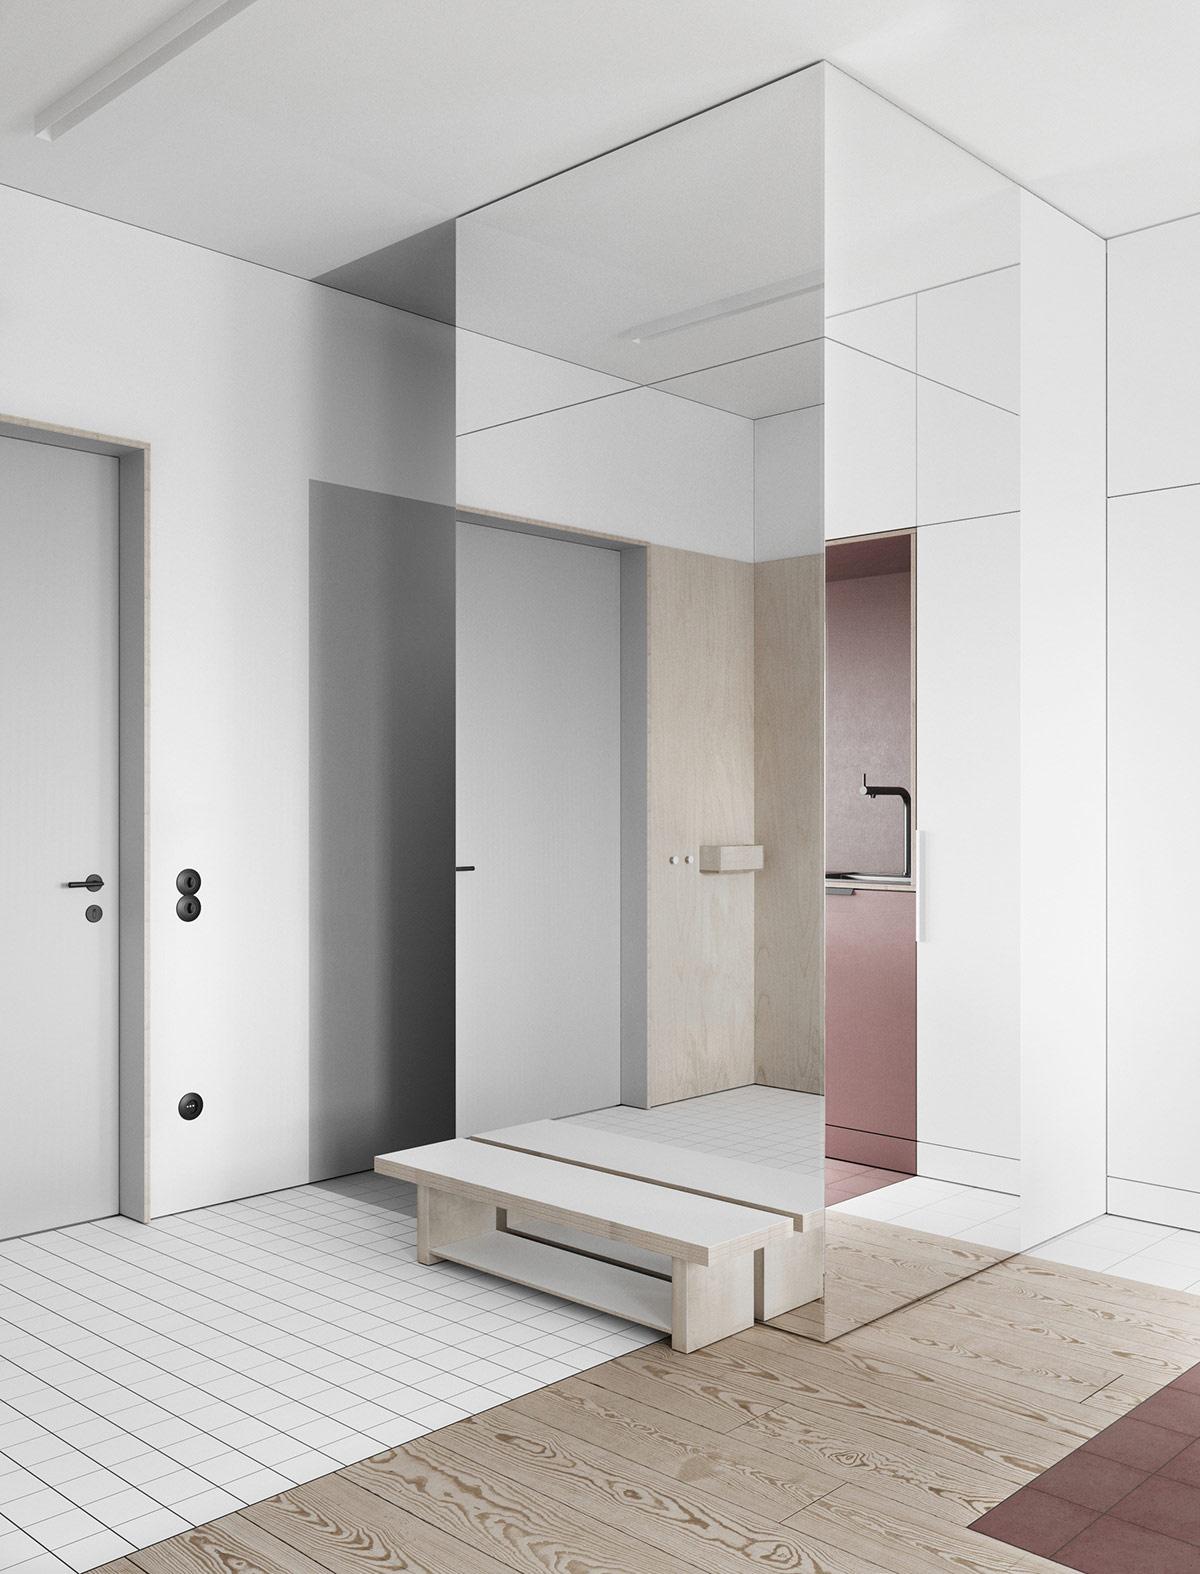 Interiors That Use Colour Blocking To Segment Space